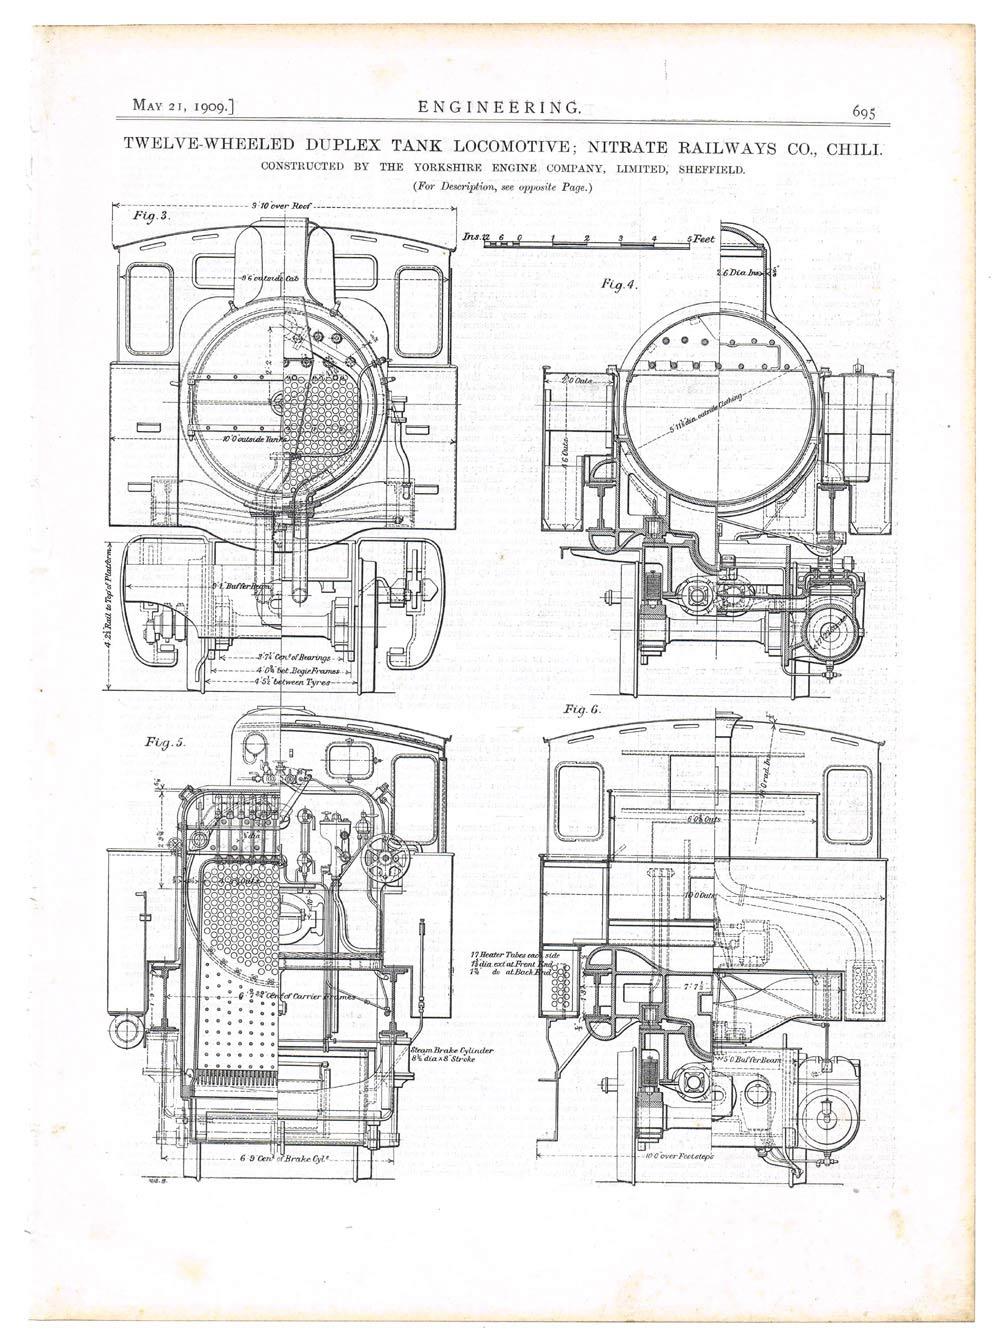 1909 Engineering Antique Print-12 Wheeled Duplex Tank